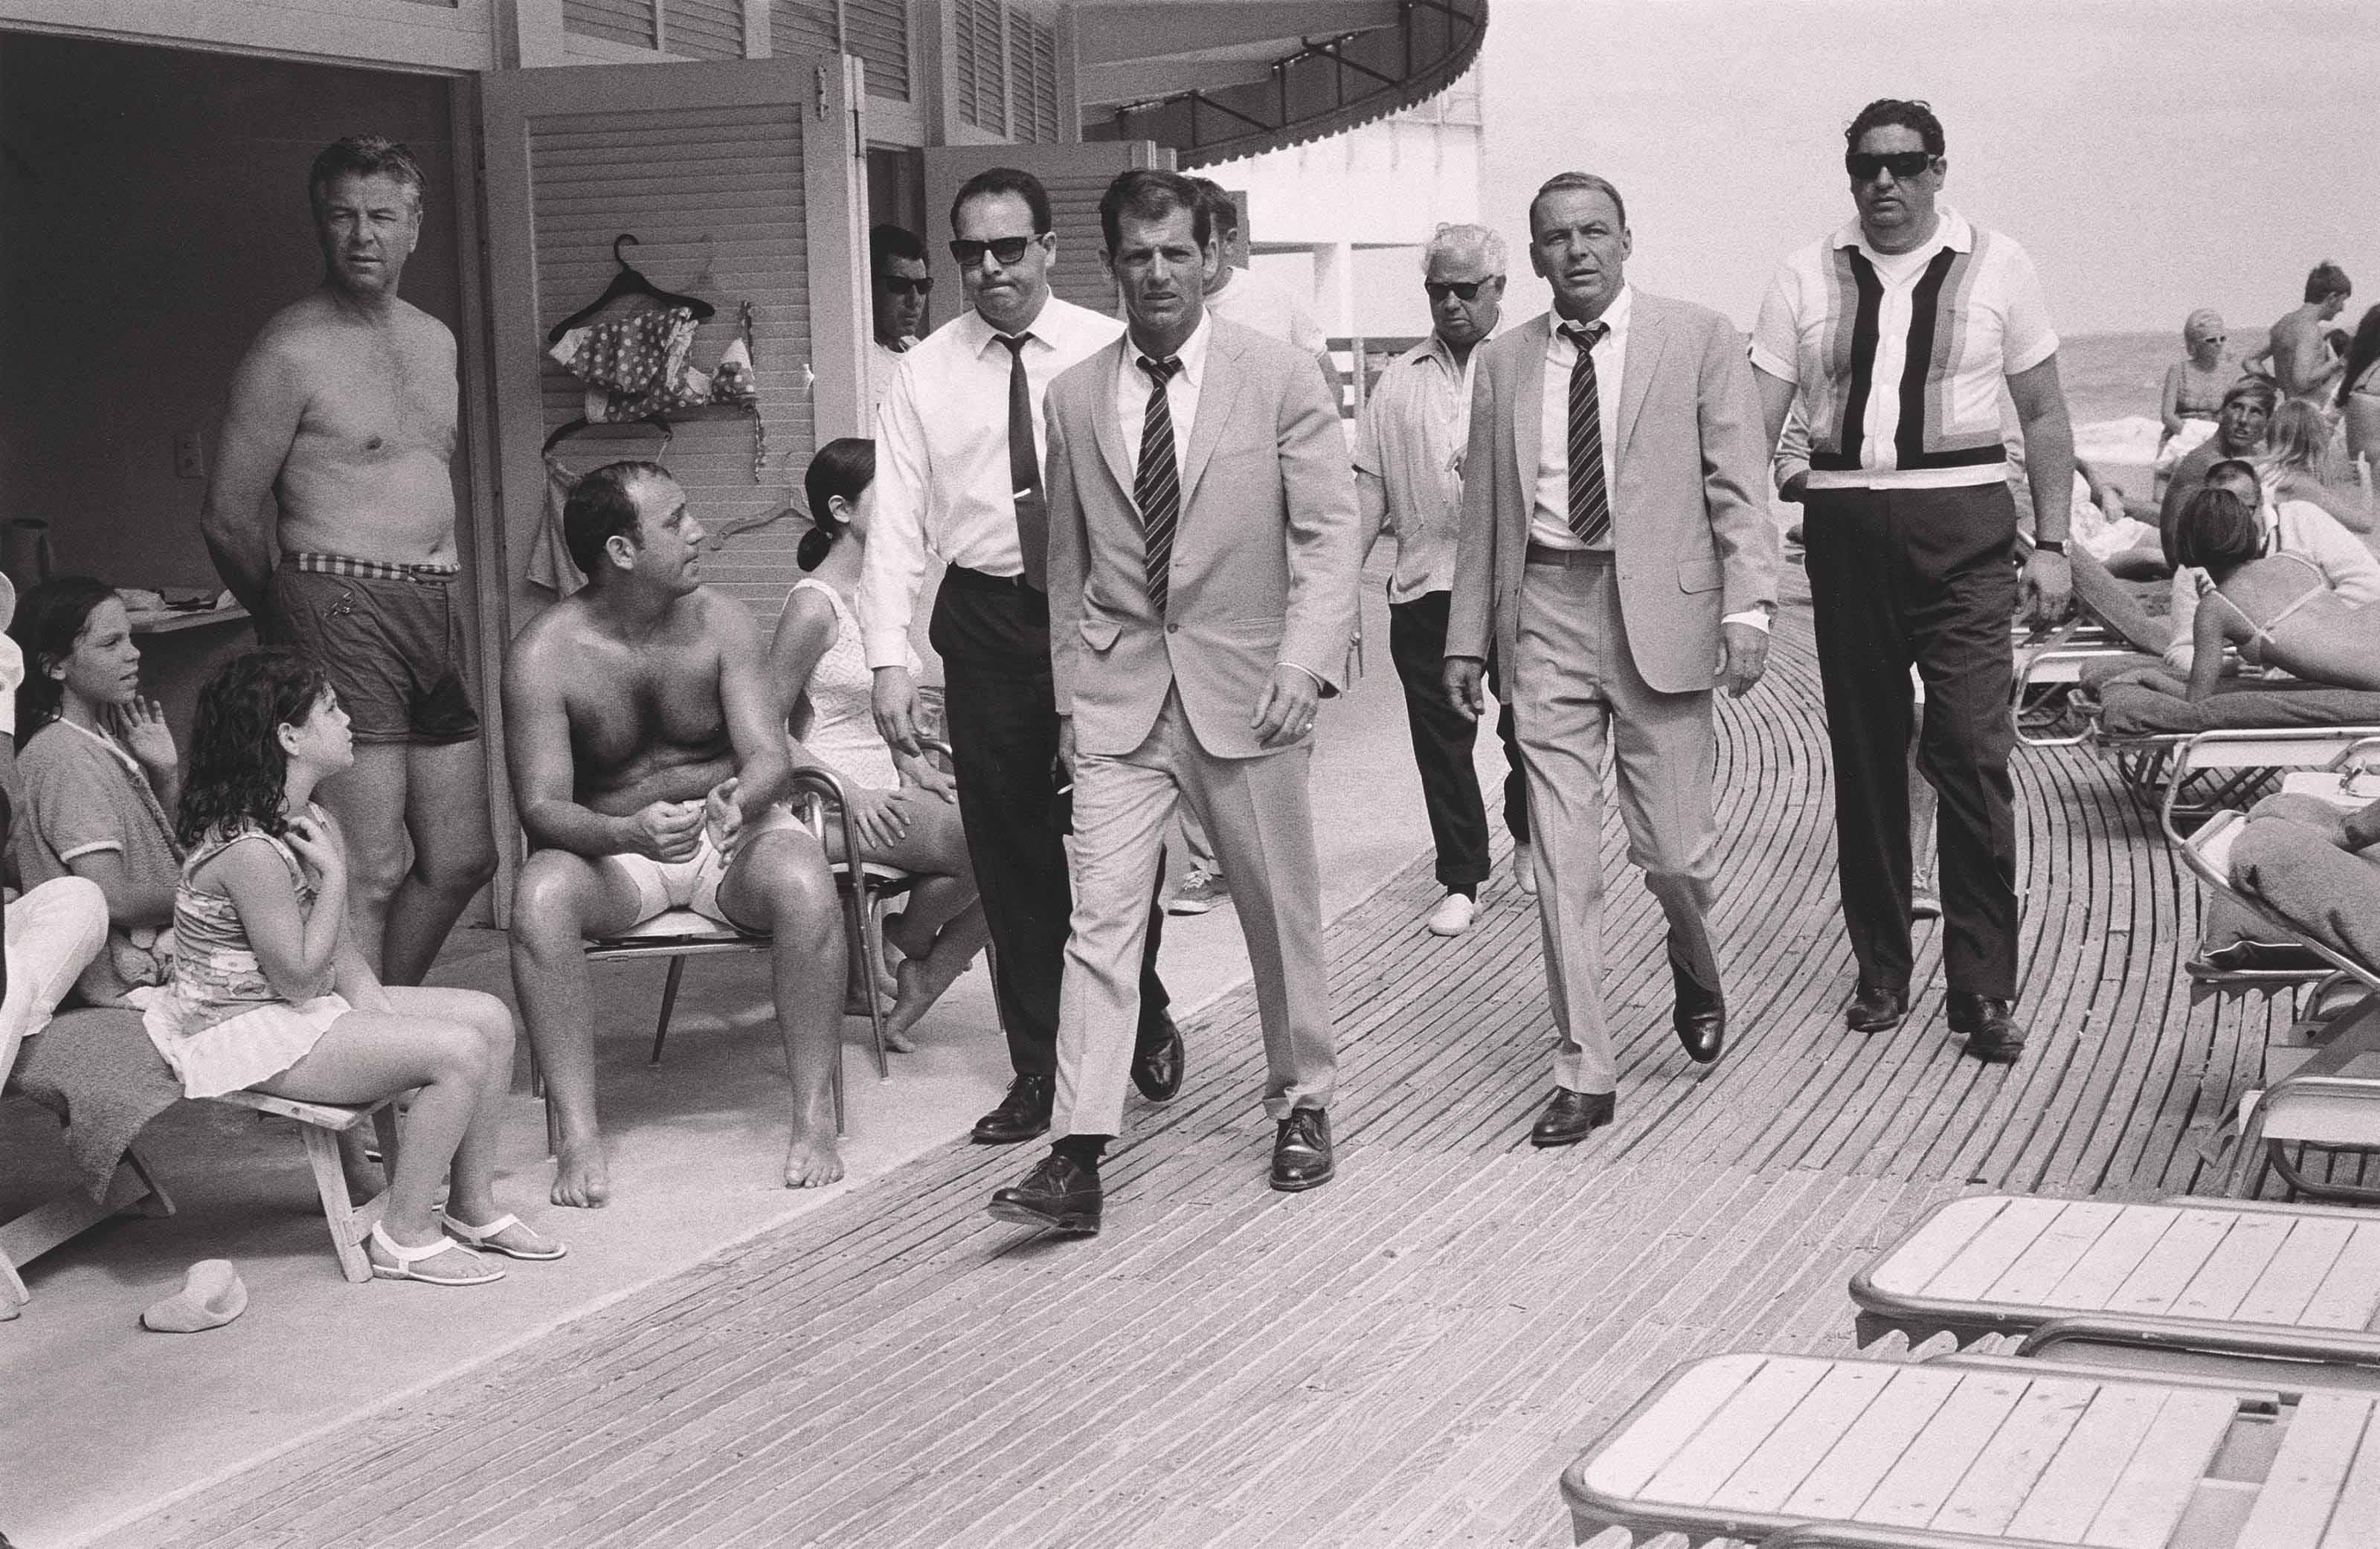 Frank Sinatra, Miami Beach, 1968